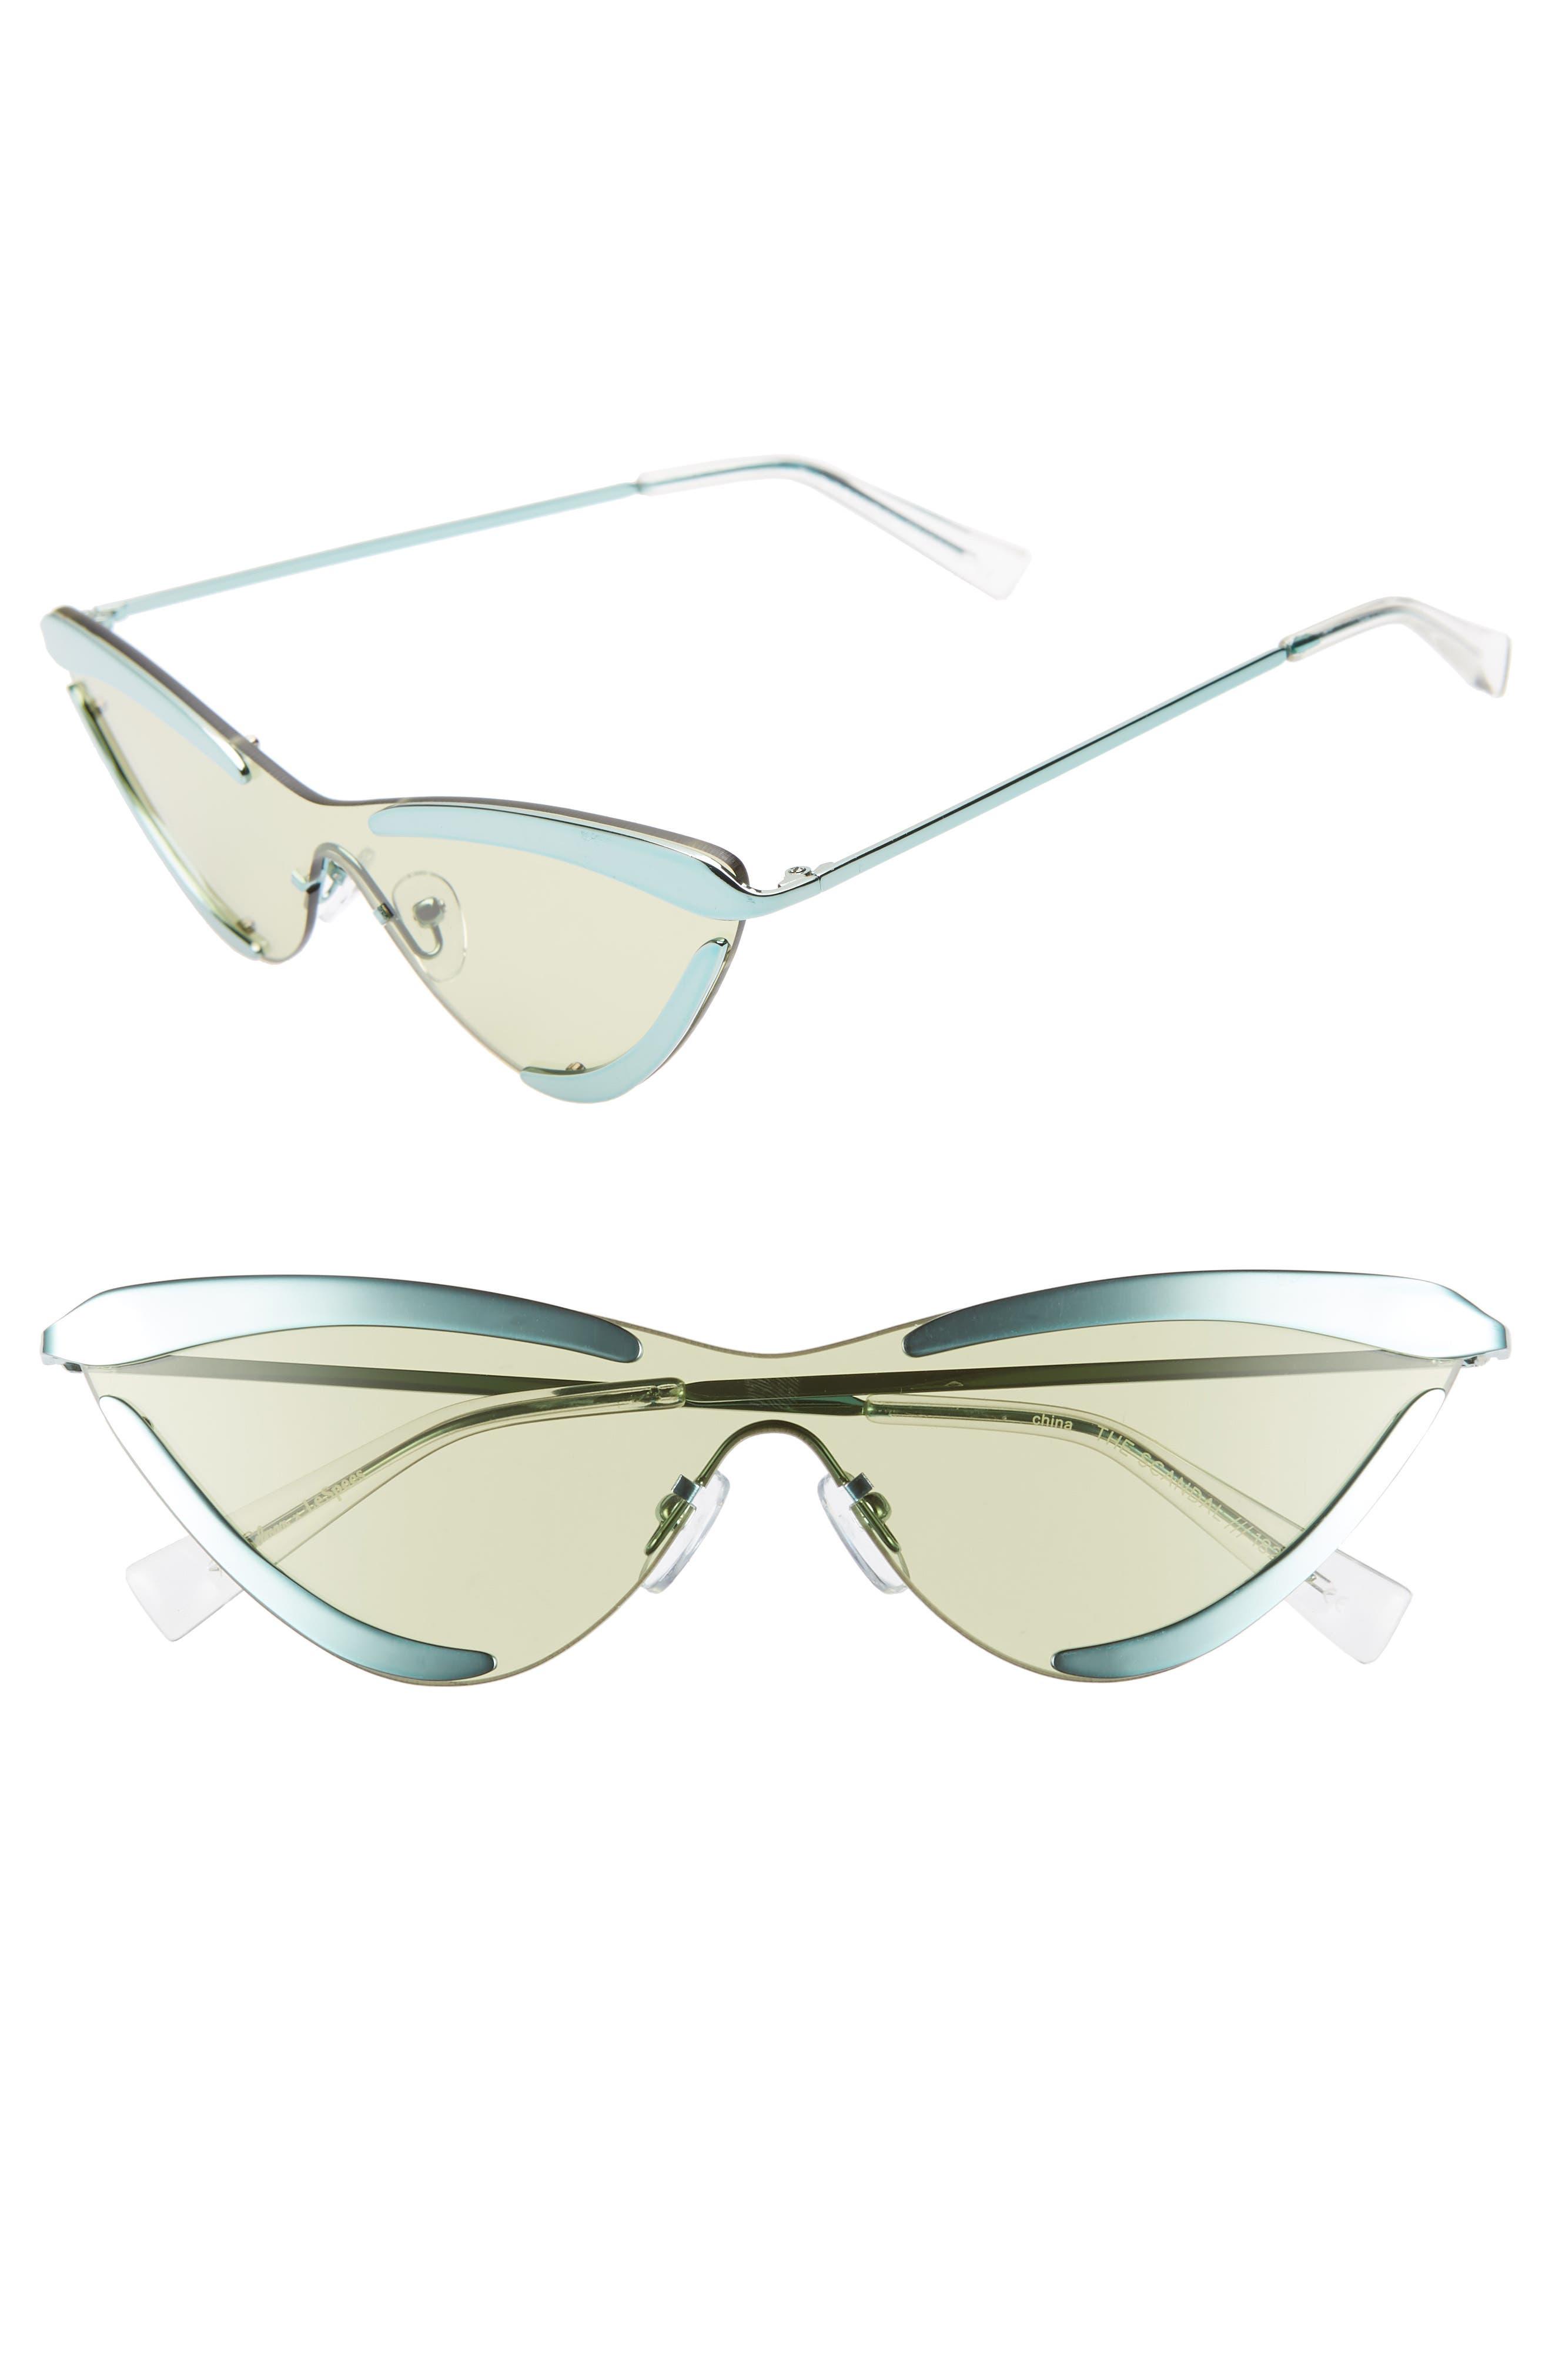 Adam Selman X Le Specs Luxe The Scandal 142Mm Cat Eye Sunglasses - Aqua